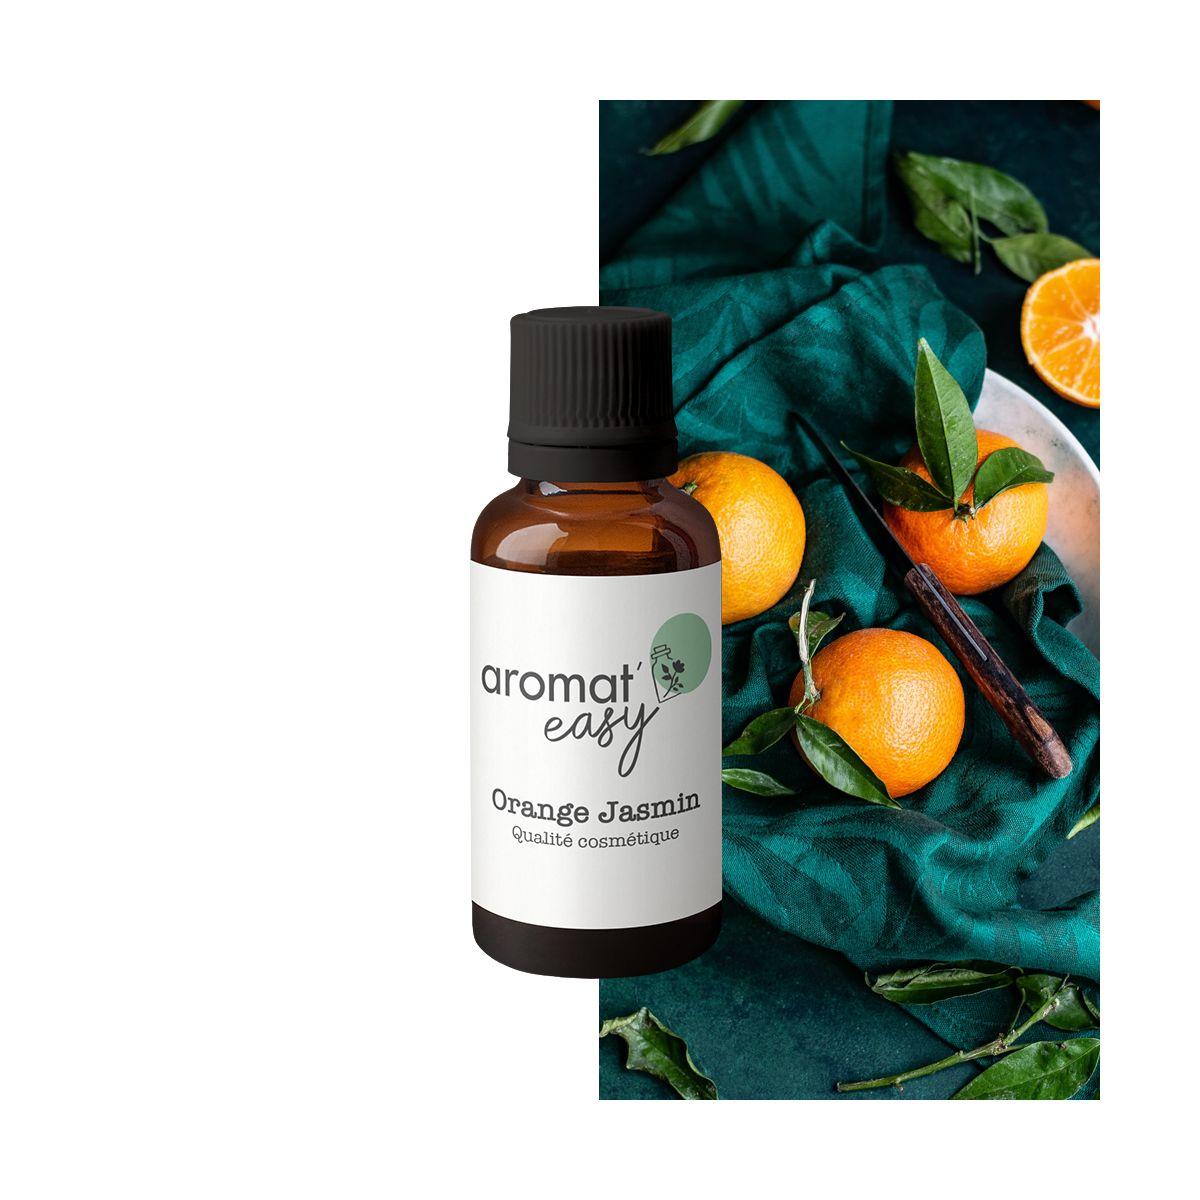 Fragrance Naturelle Orange jasmin